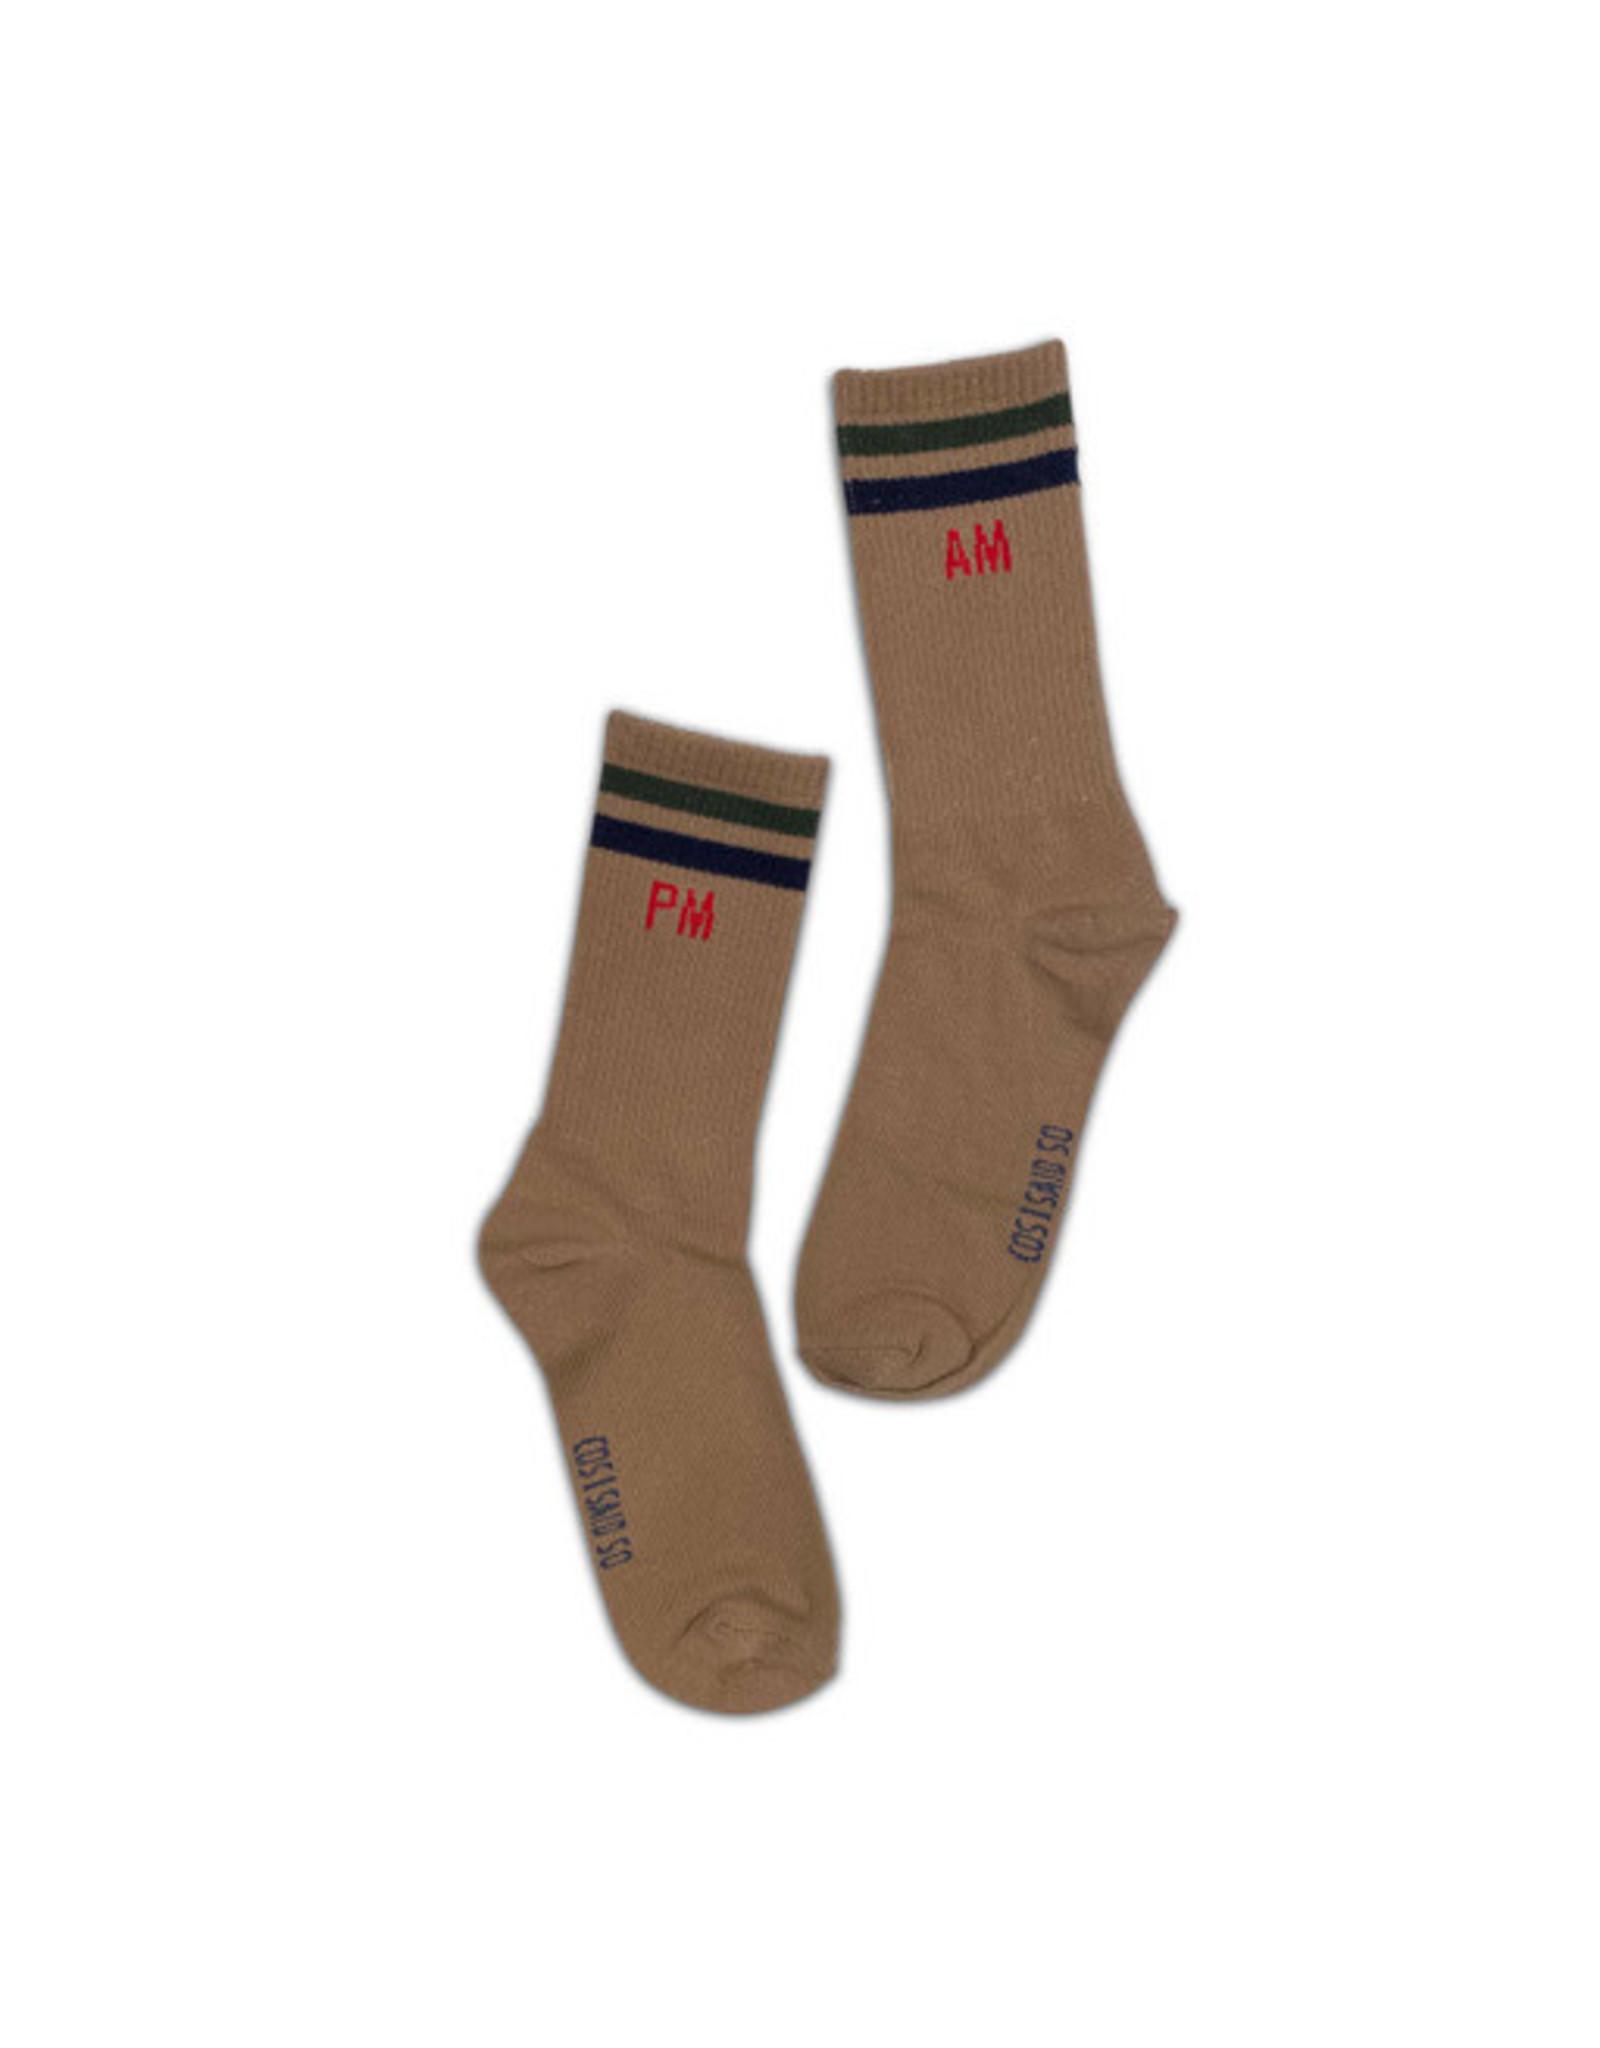 Cos I Said So sokken  am /pm